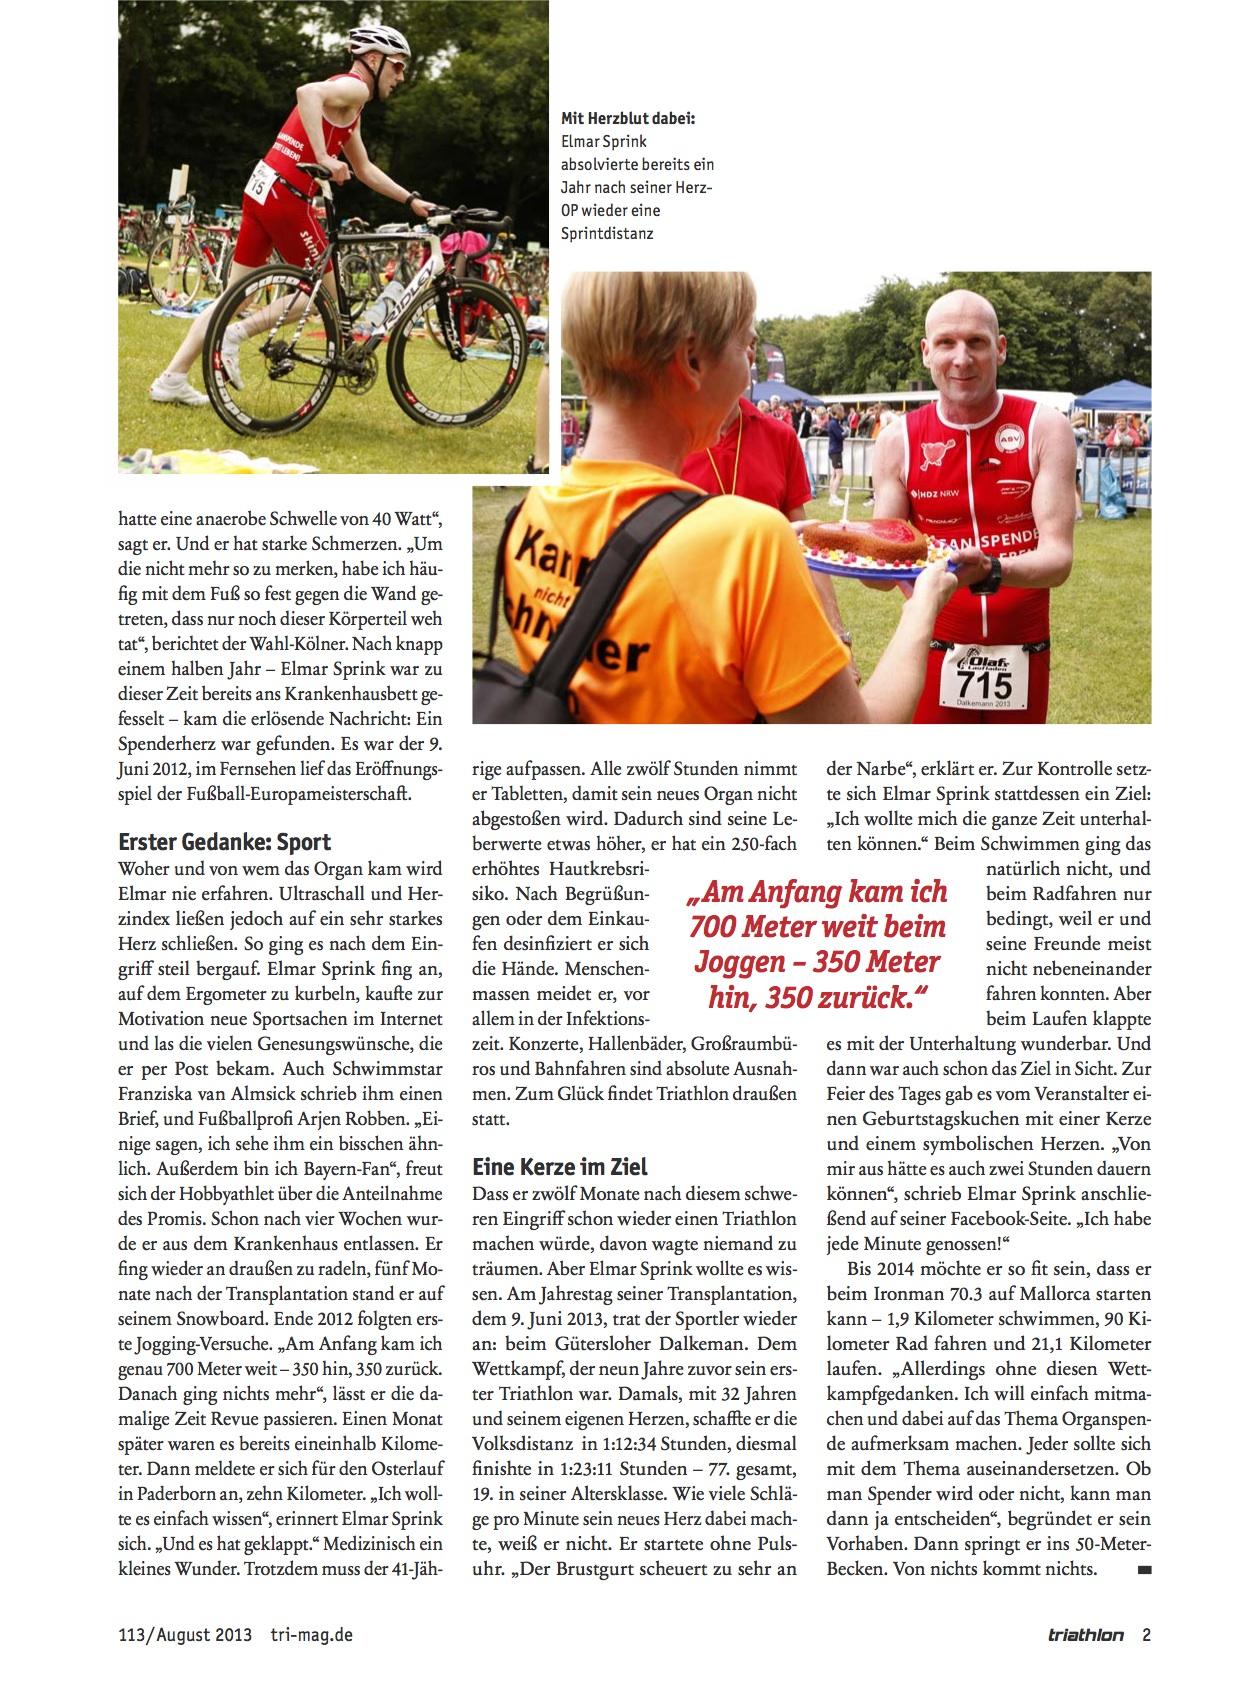 Triathlon_Juli_2013 Kopie _2 Kopie .jpg